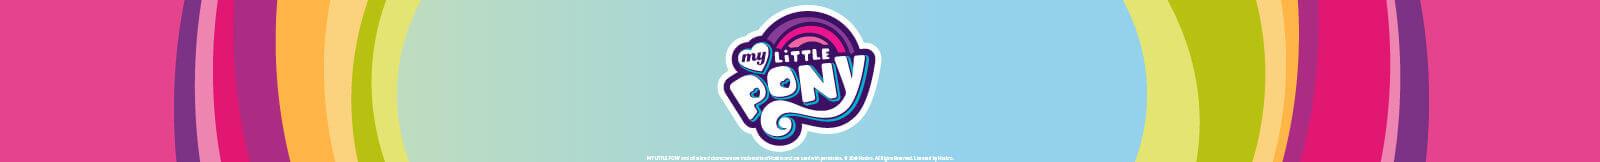 My Little Pony - mlp - My Little Pony stuffed animal